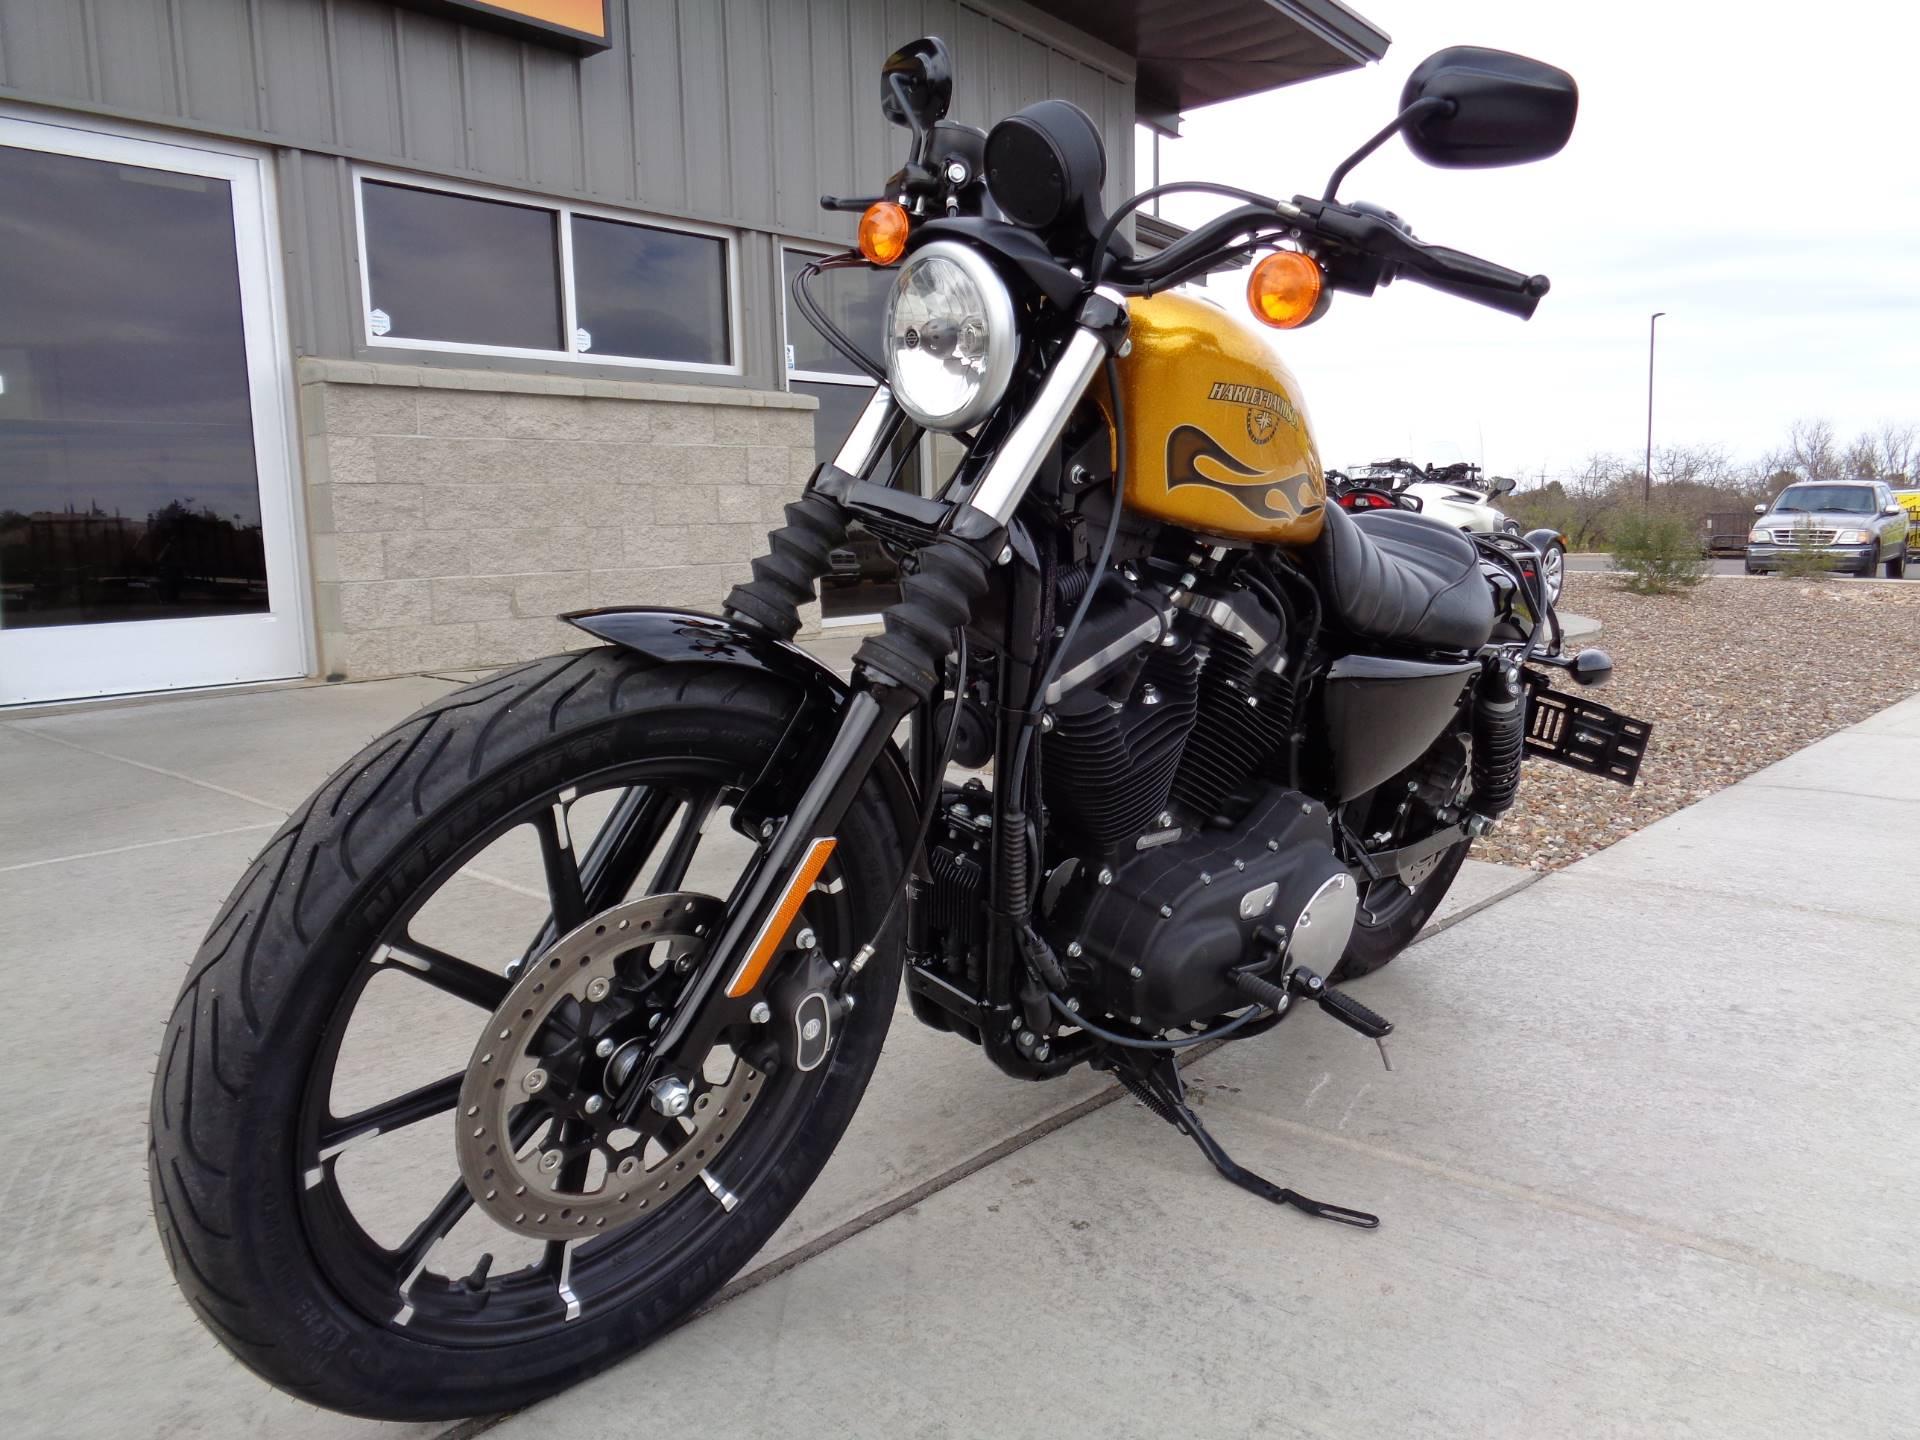 2016 Harley-Davidson Iron 883 2